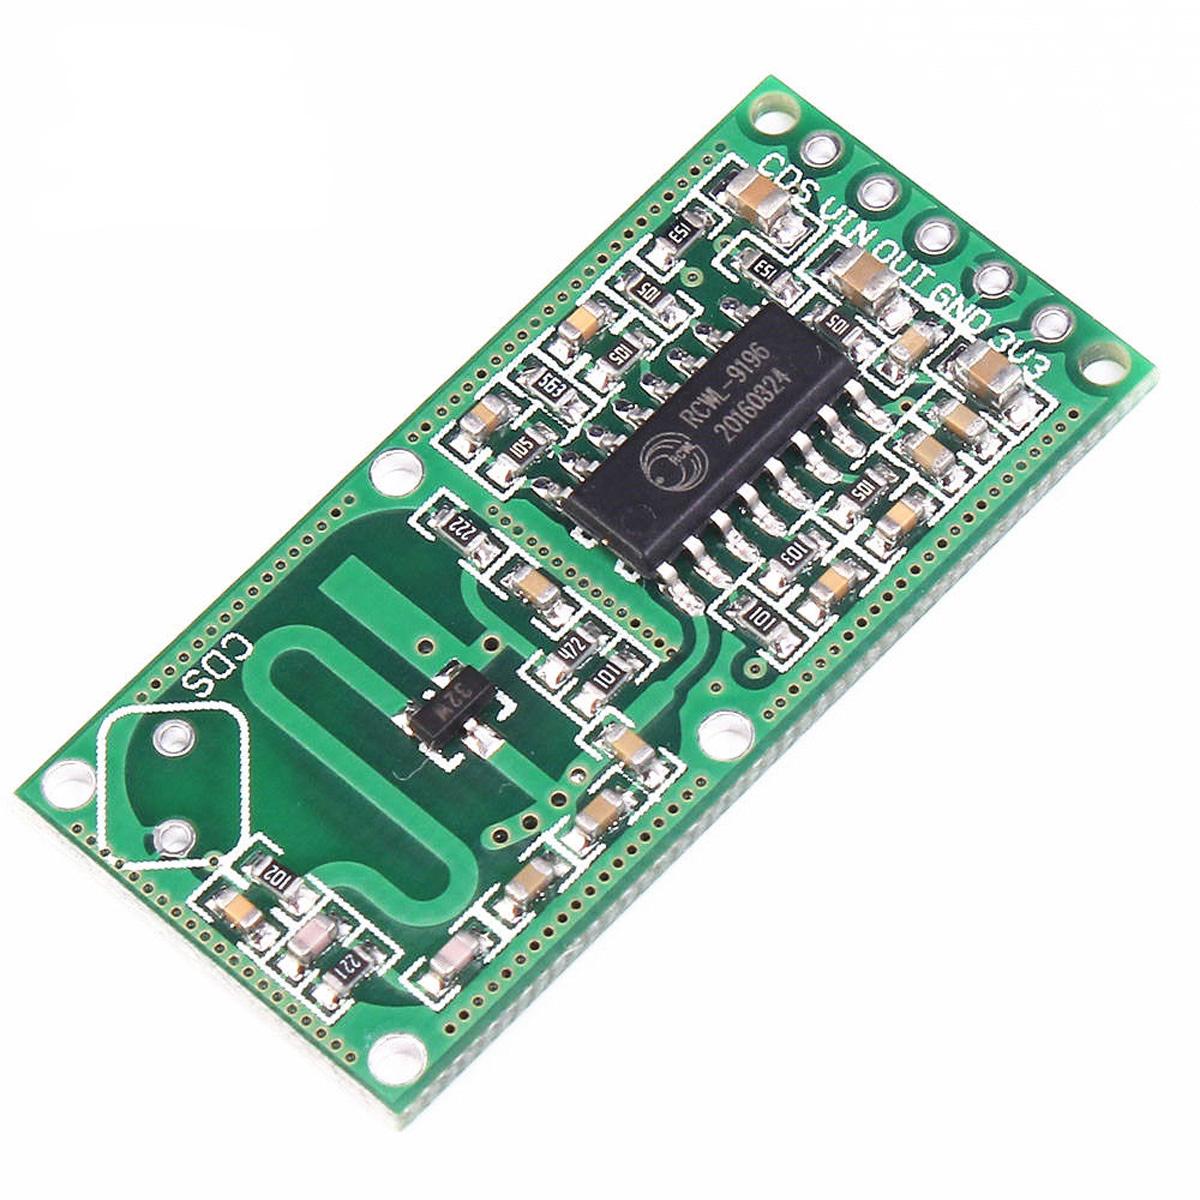 RCWL0516 Microwave Motion Sensor Module